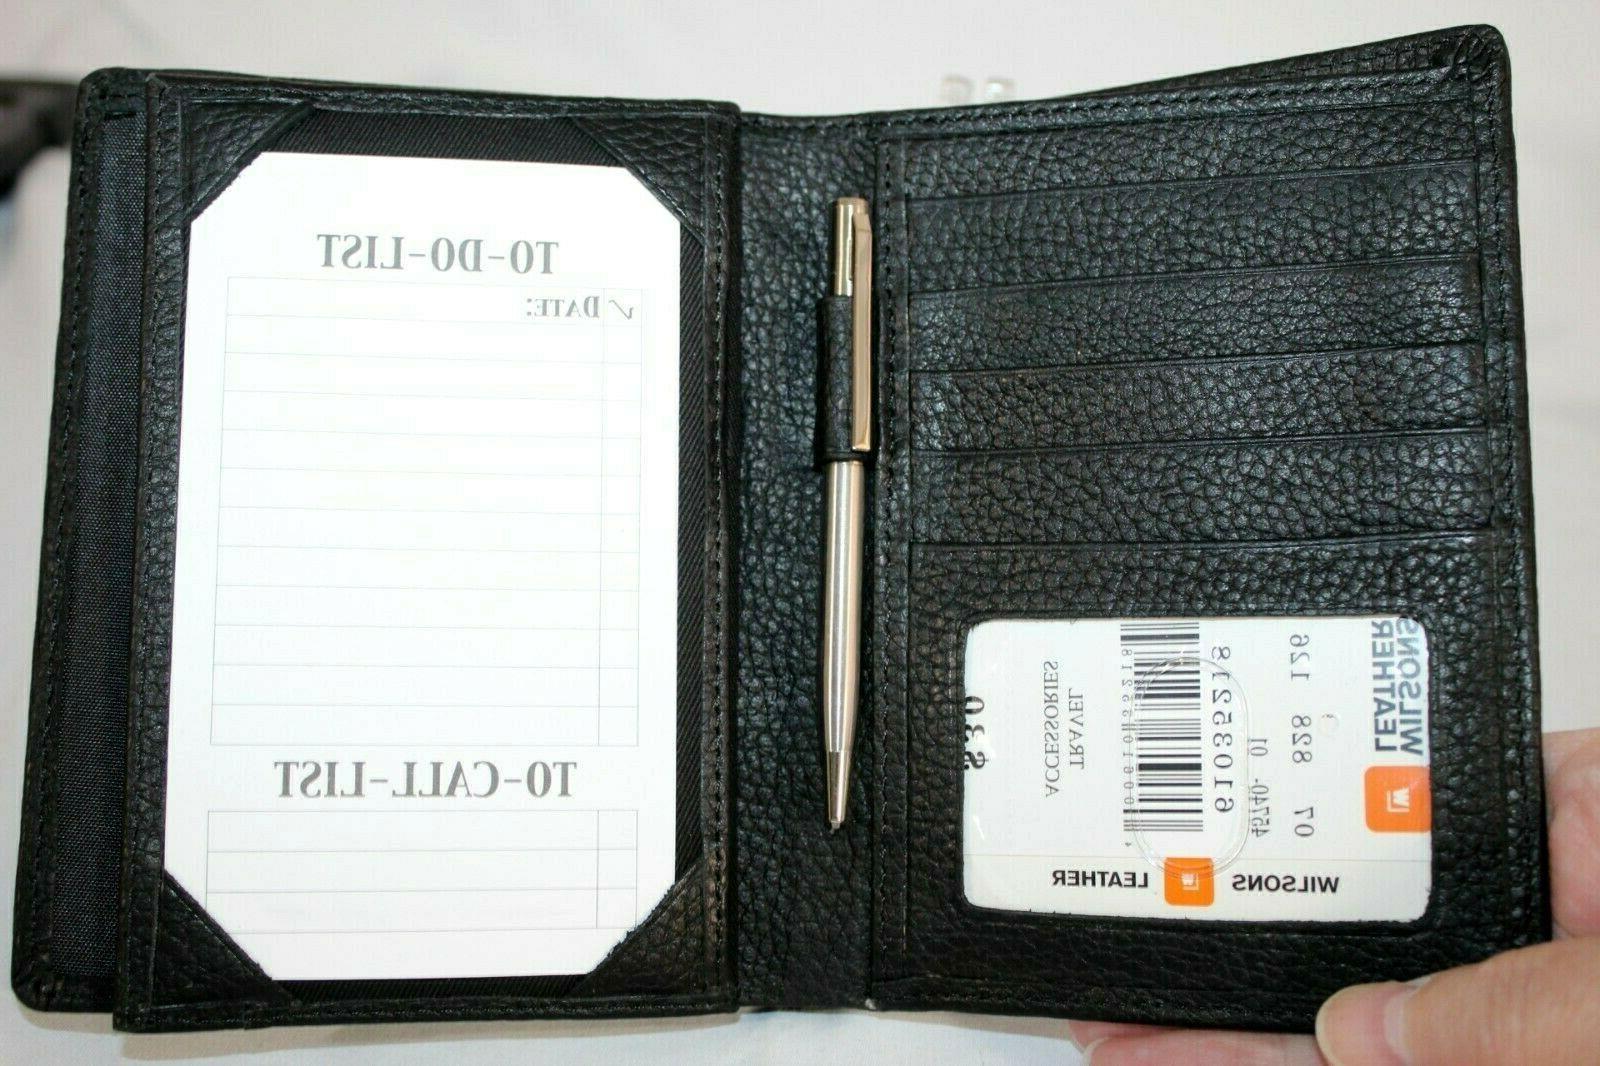 WILSONS LEATHER Travel Accessories Passport Organizing NEW